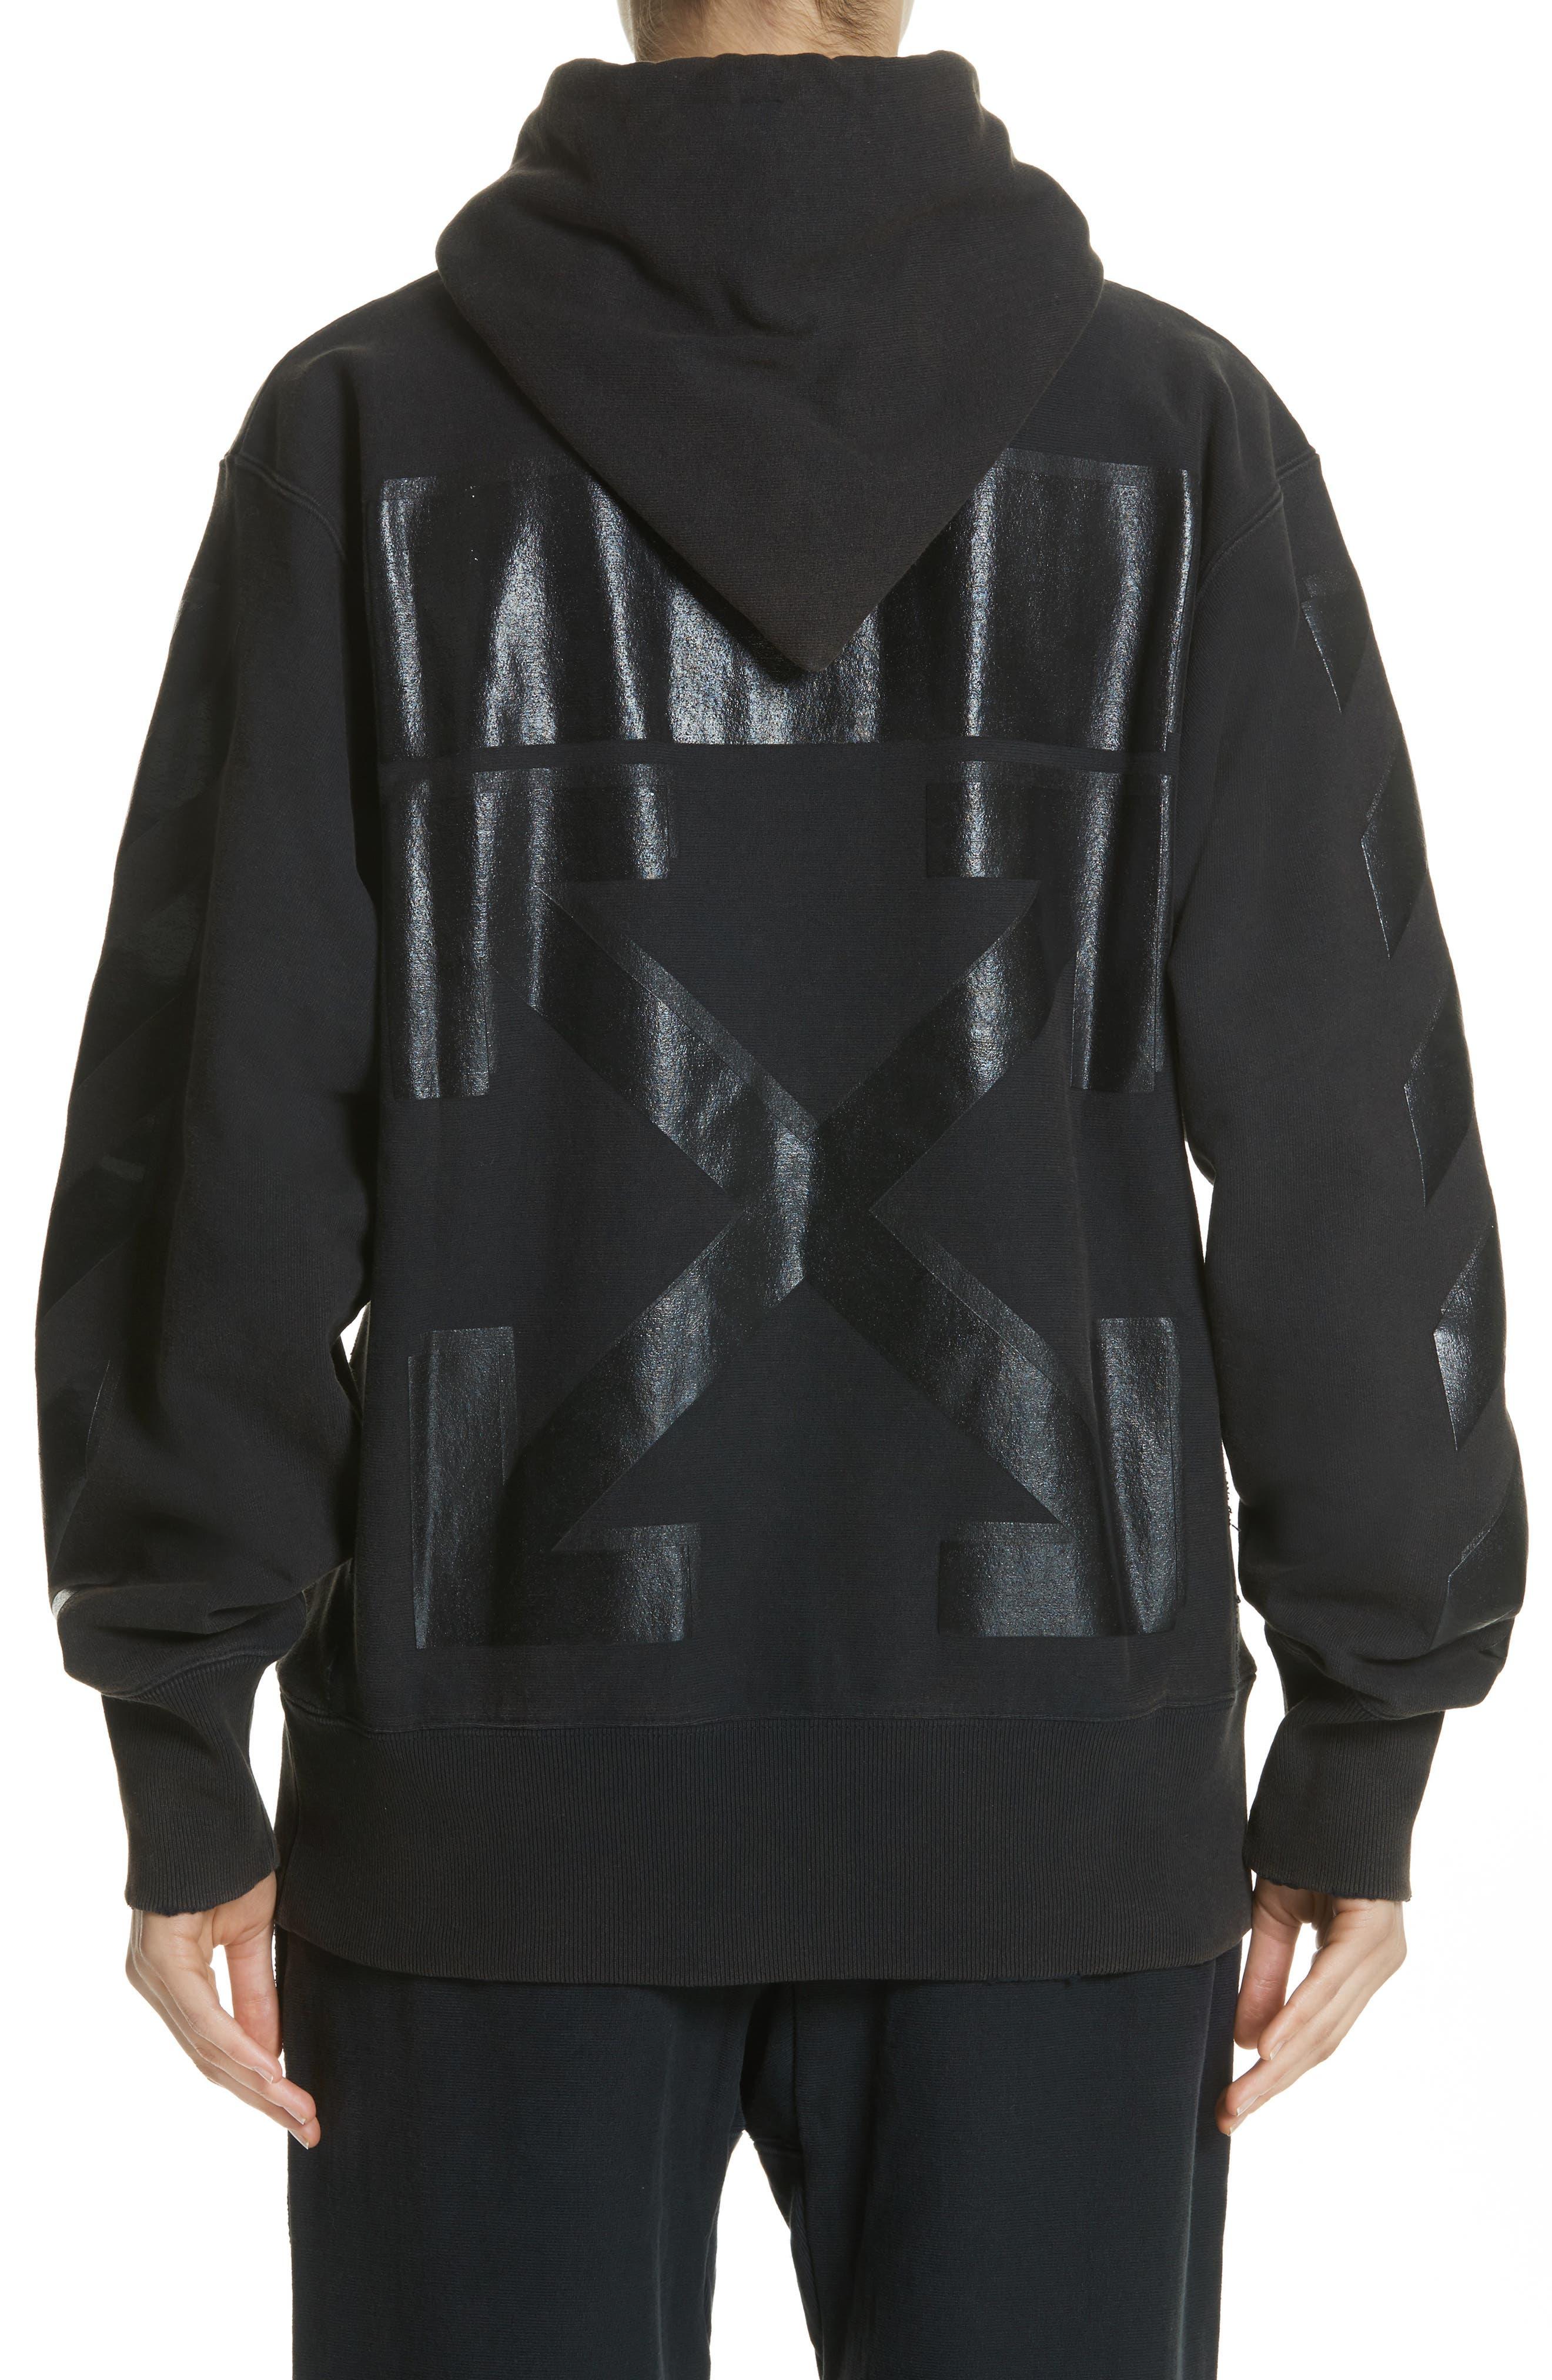 x Champion Pullover Hoodie,                             Alternate thumbnail 2, color,                             Black/ Black